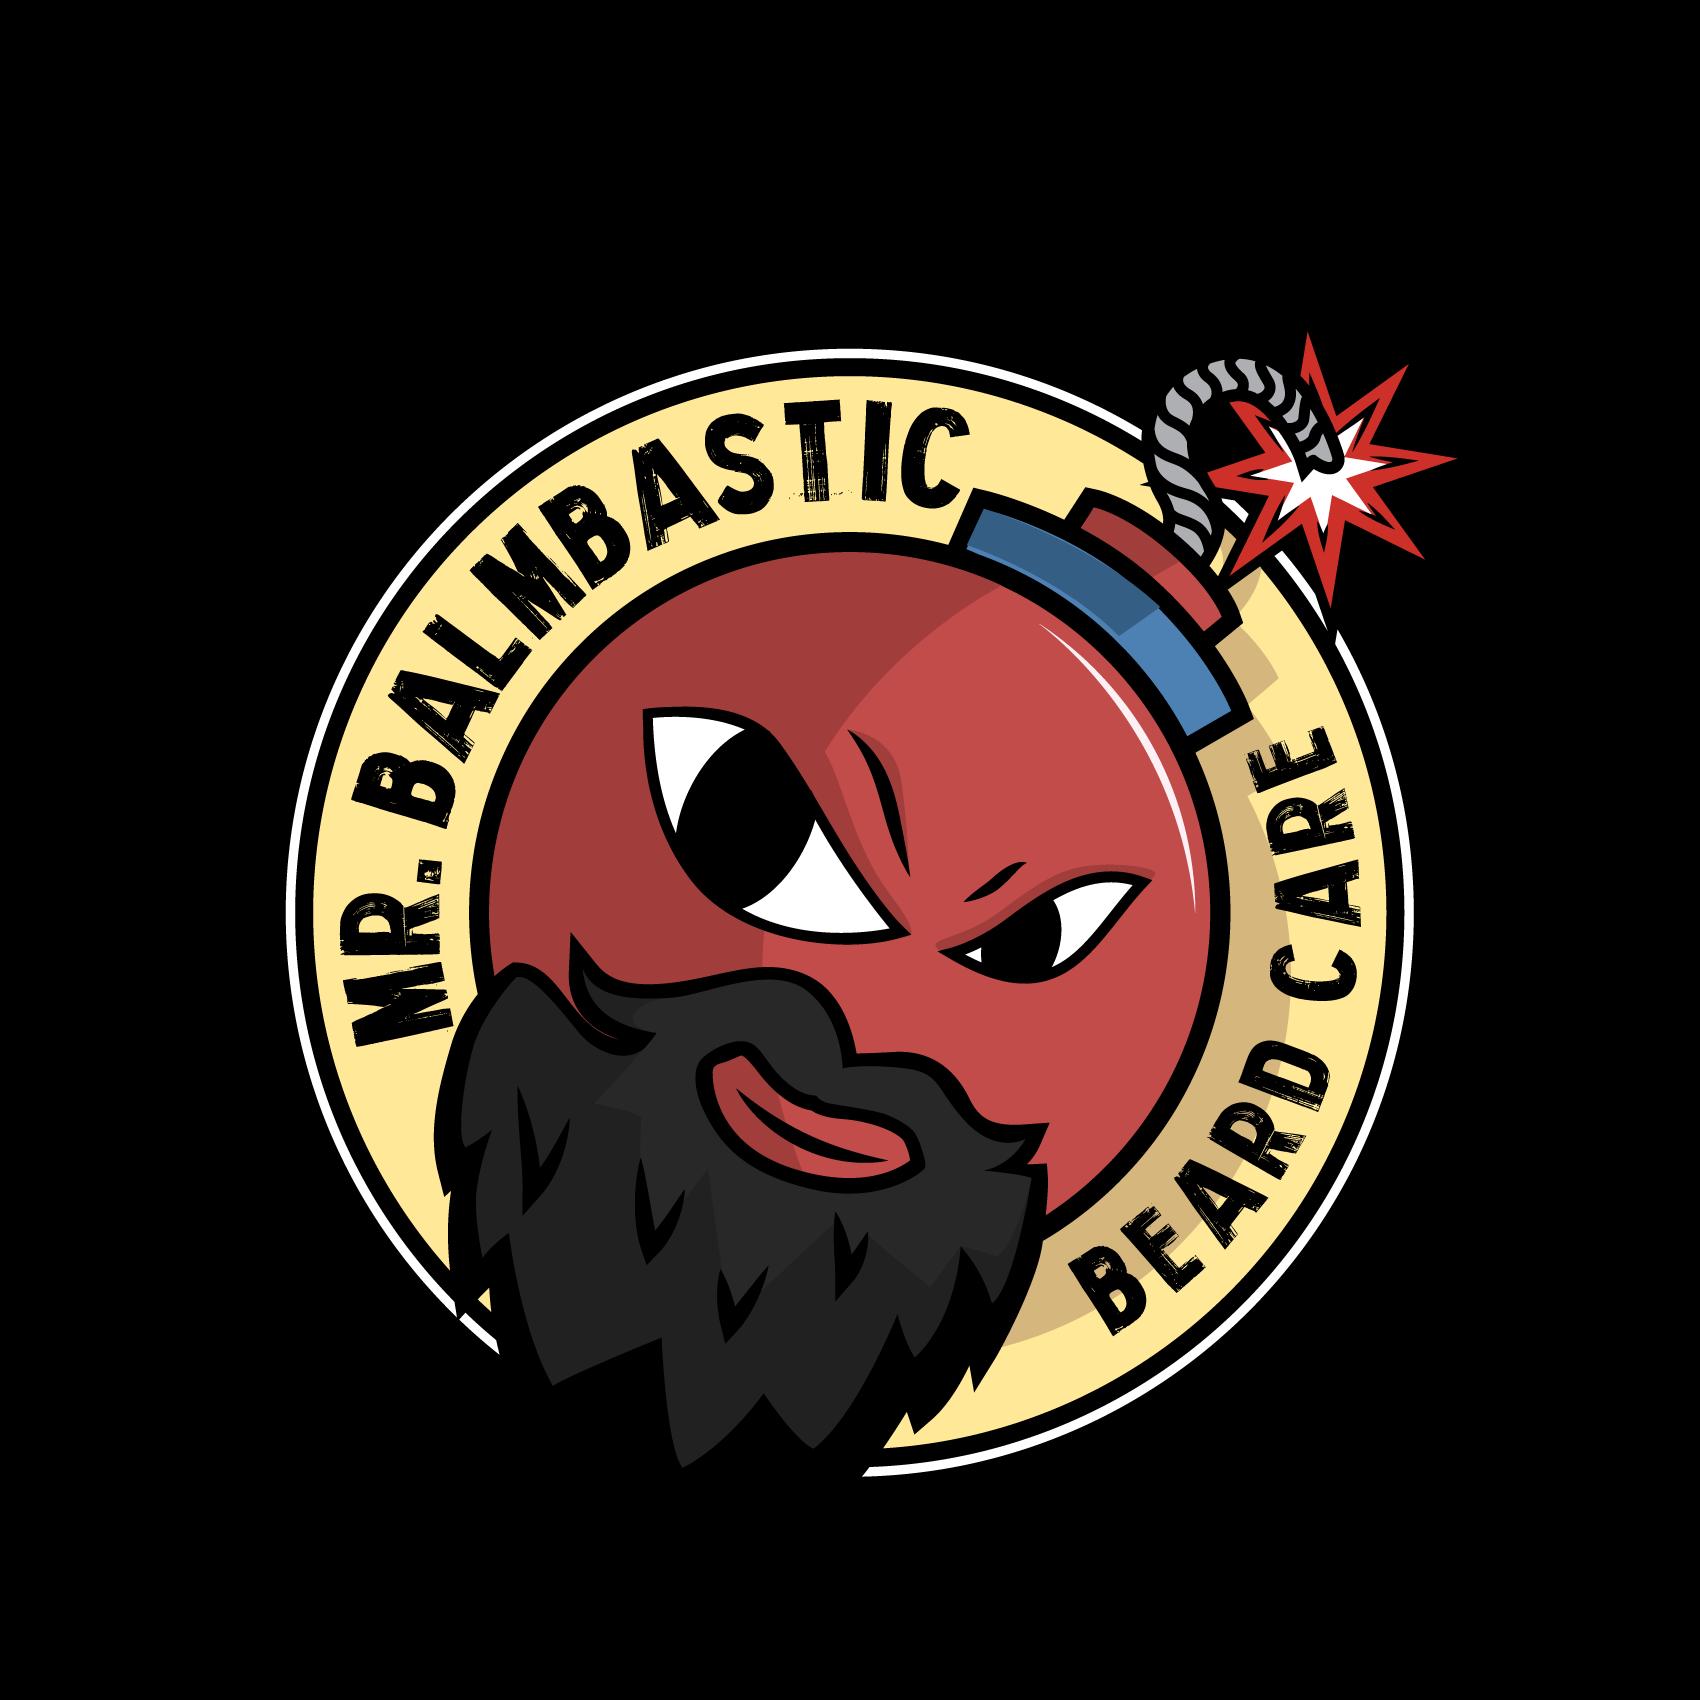 mr-balmbastic-1.png